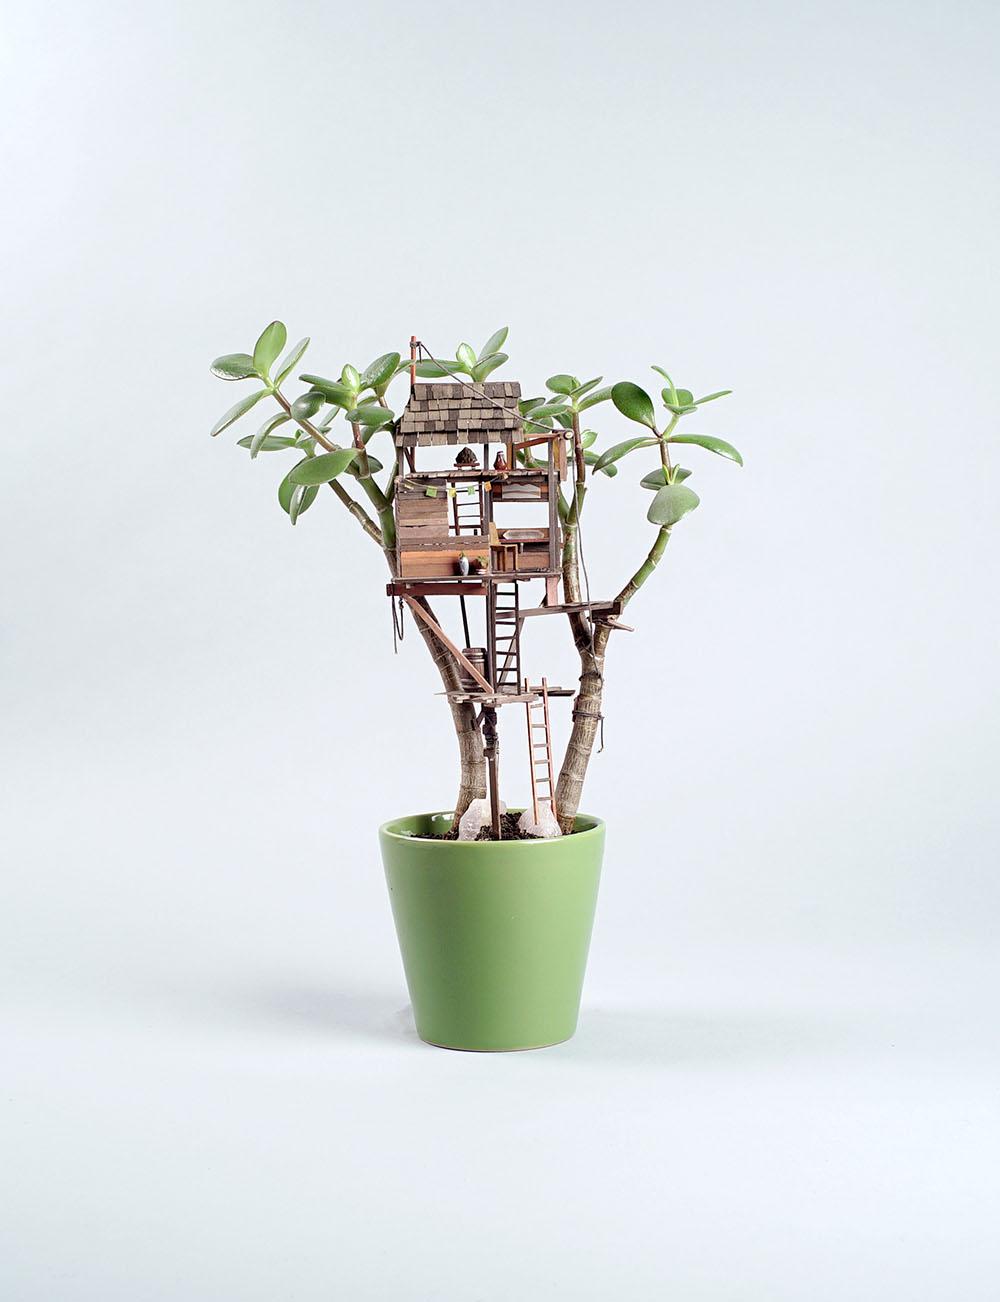 case-su-albero-miniatura-jedediah-corwyn-voltz-8